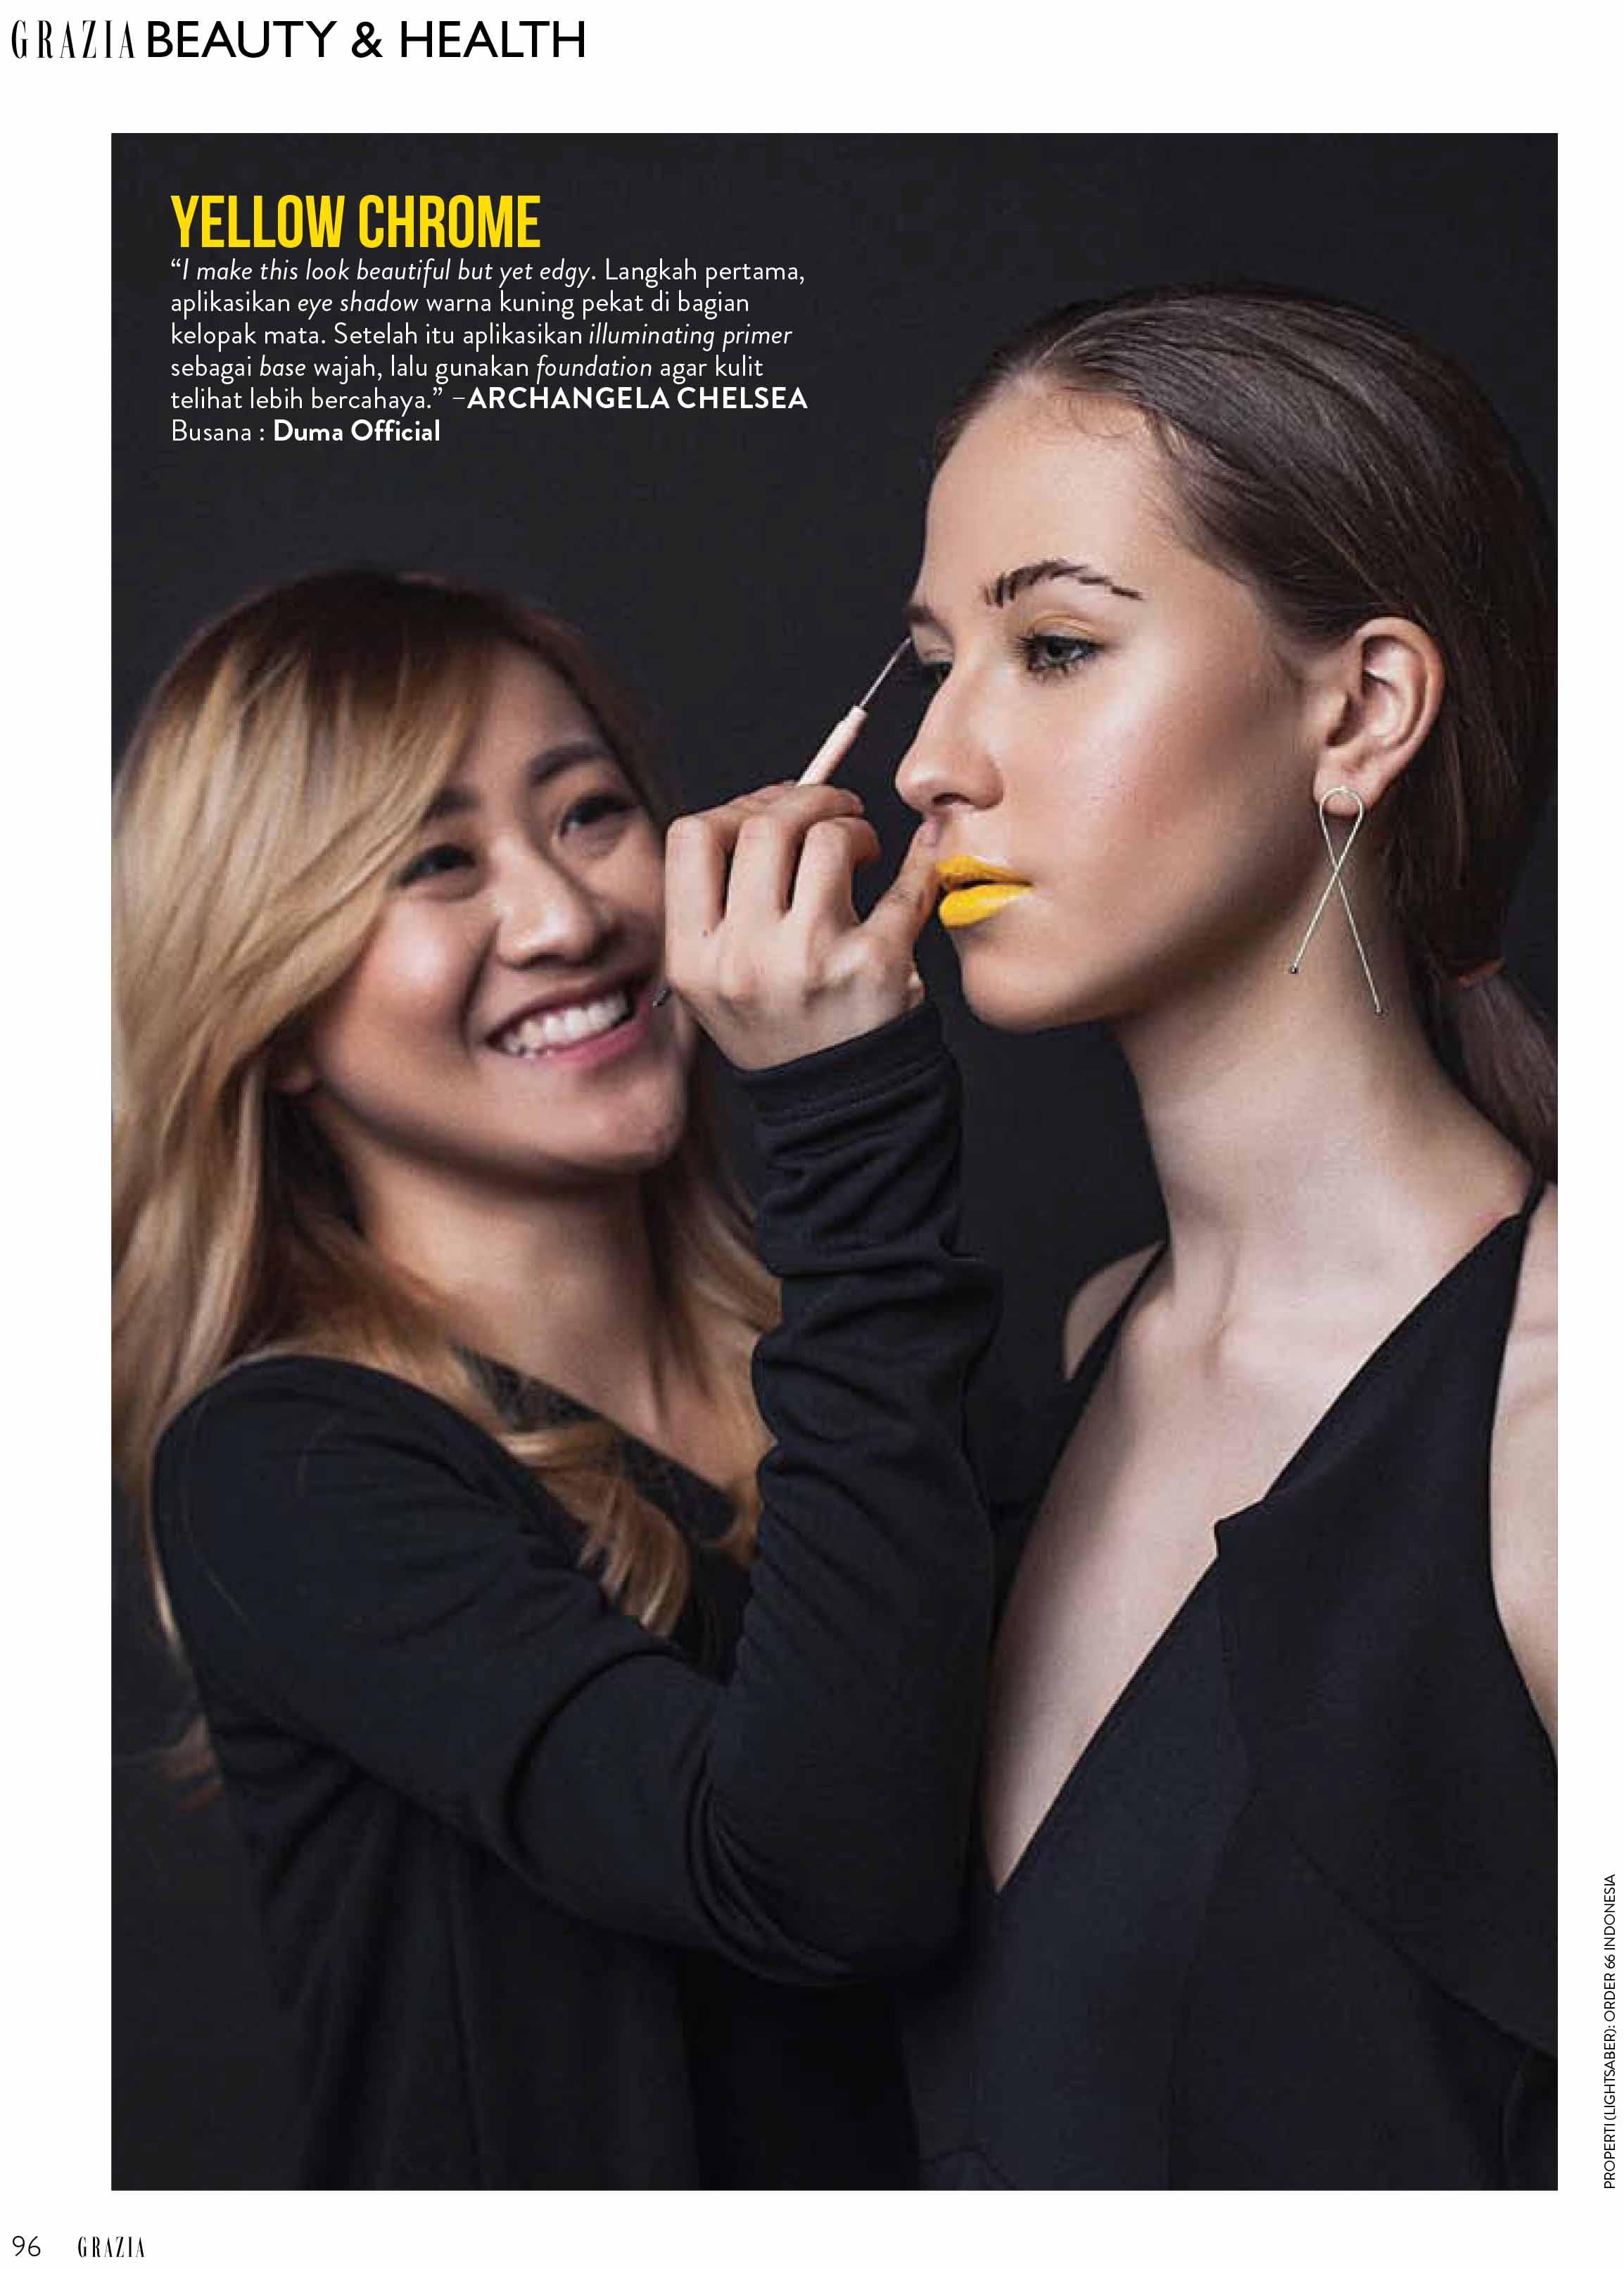 Grazia Magazine 2017 - Top 3 Makeup Artist